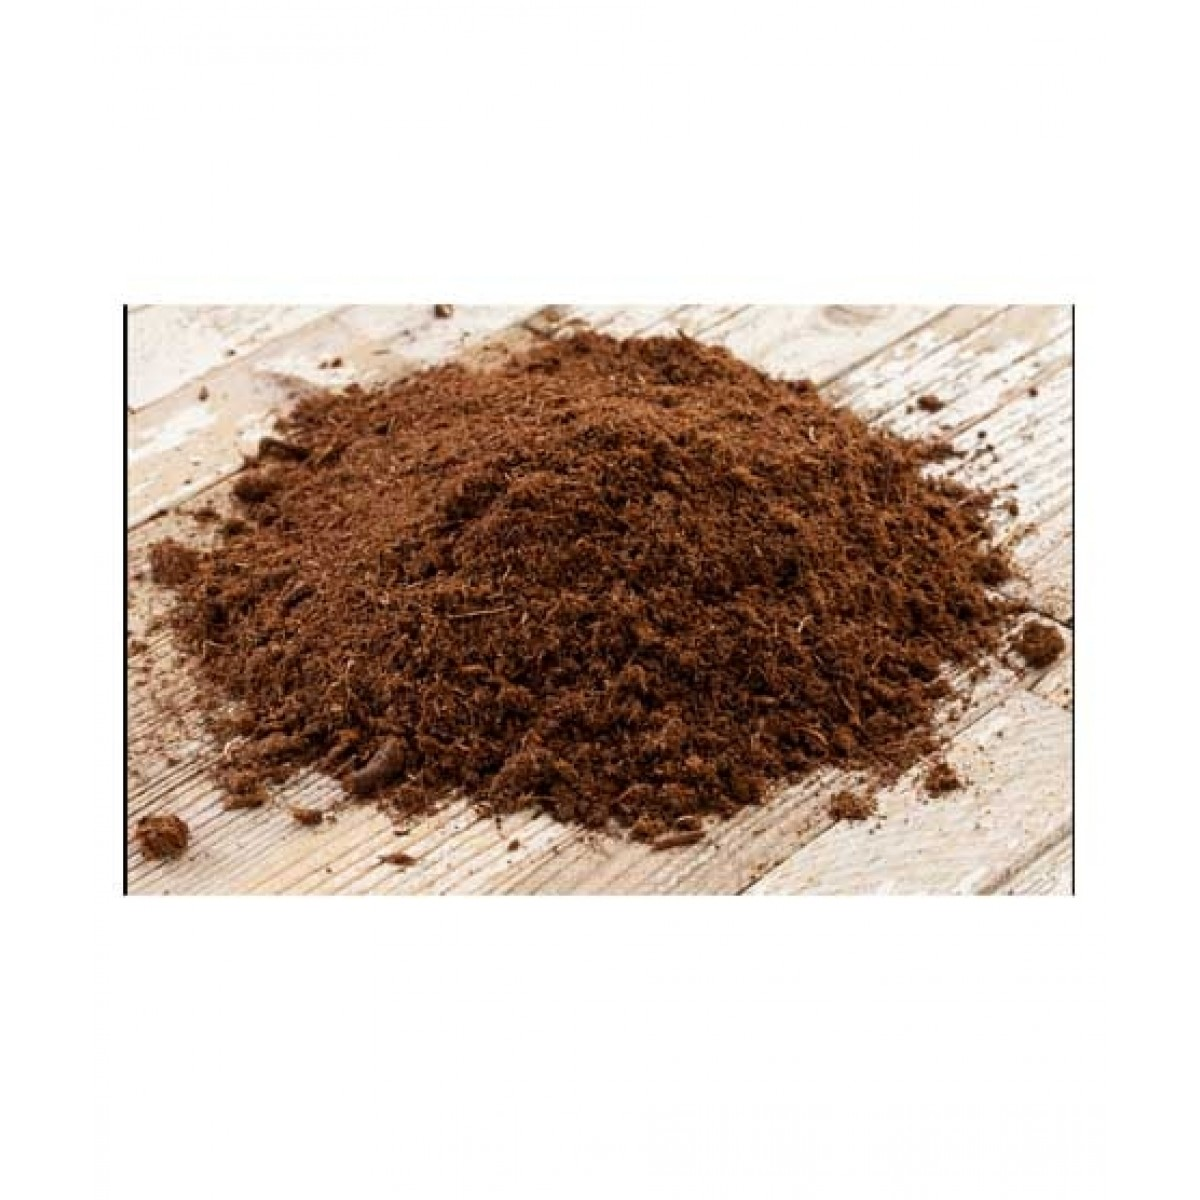 Diy Store Peat Moss For All Type Seedling Garden Mix Soil